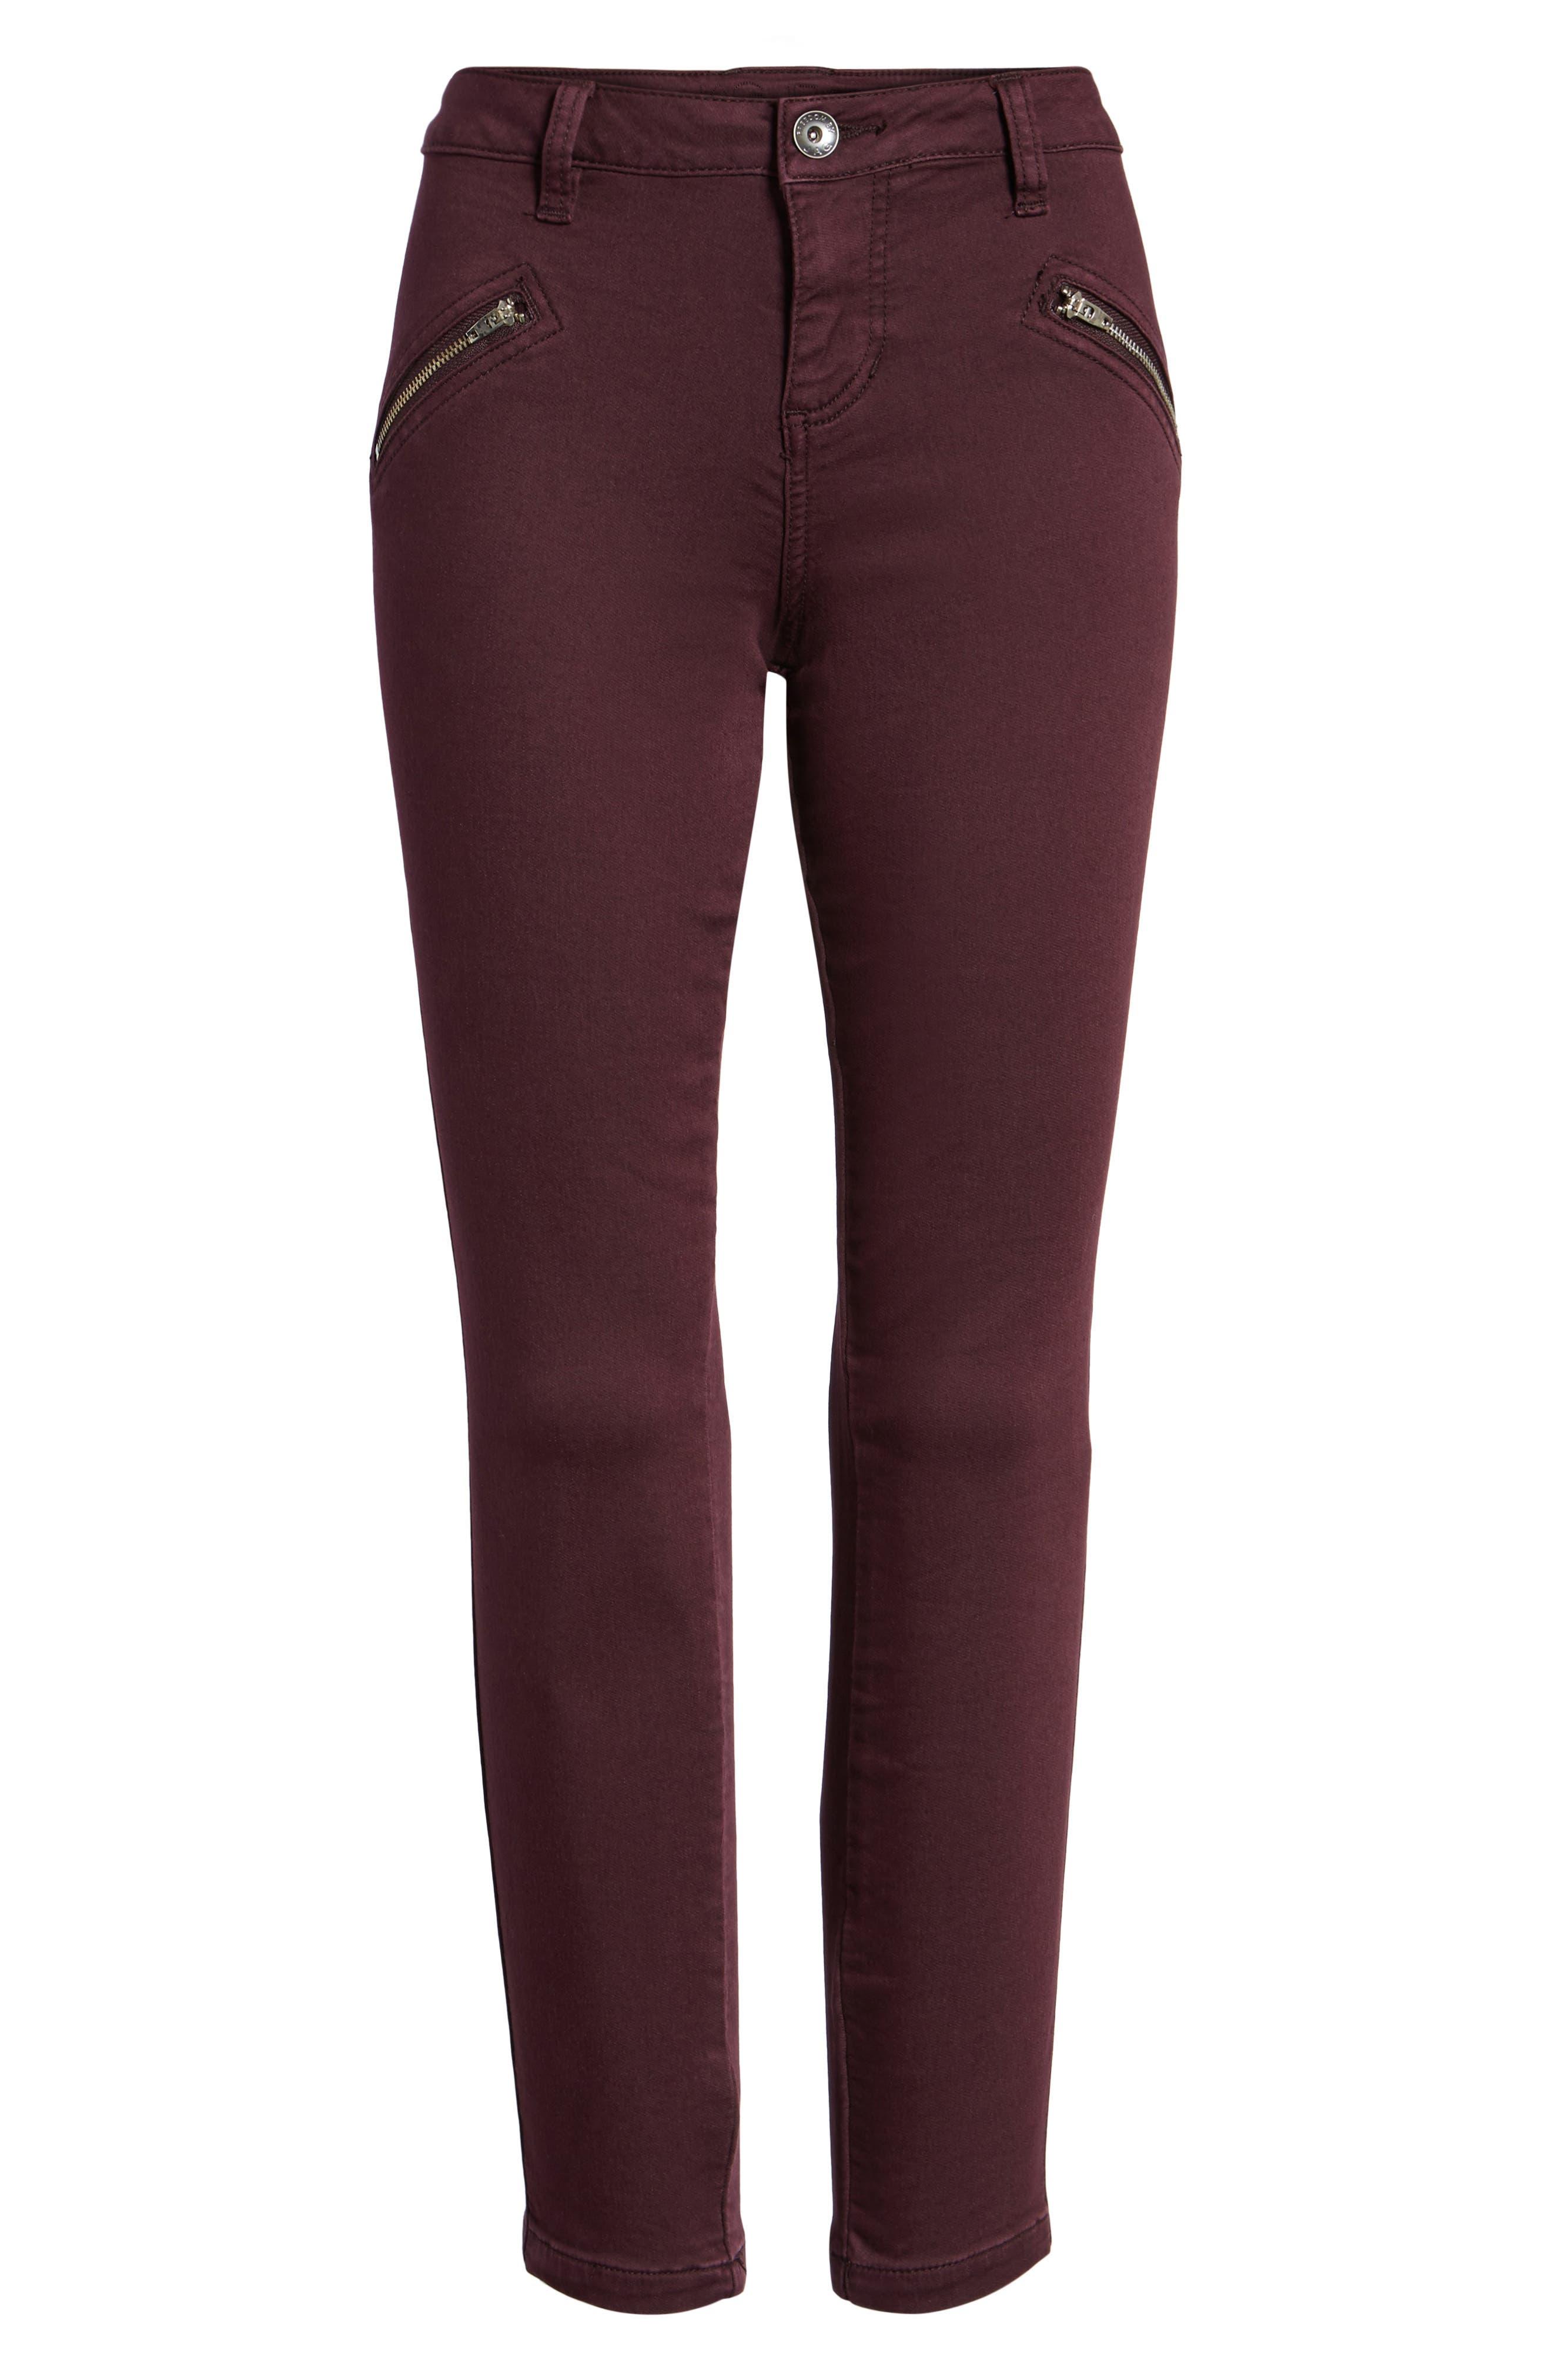 Ryan Knit Skinny Jeans,                             Alternate thumbnail 6, color,                             575